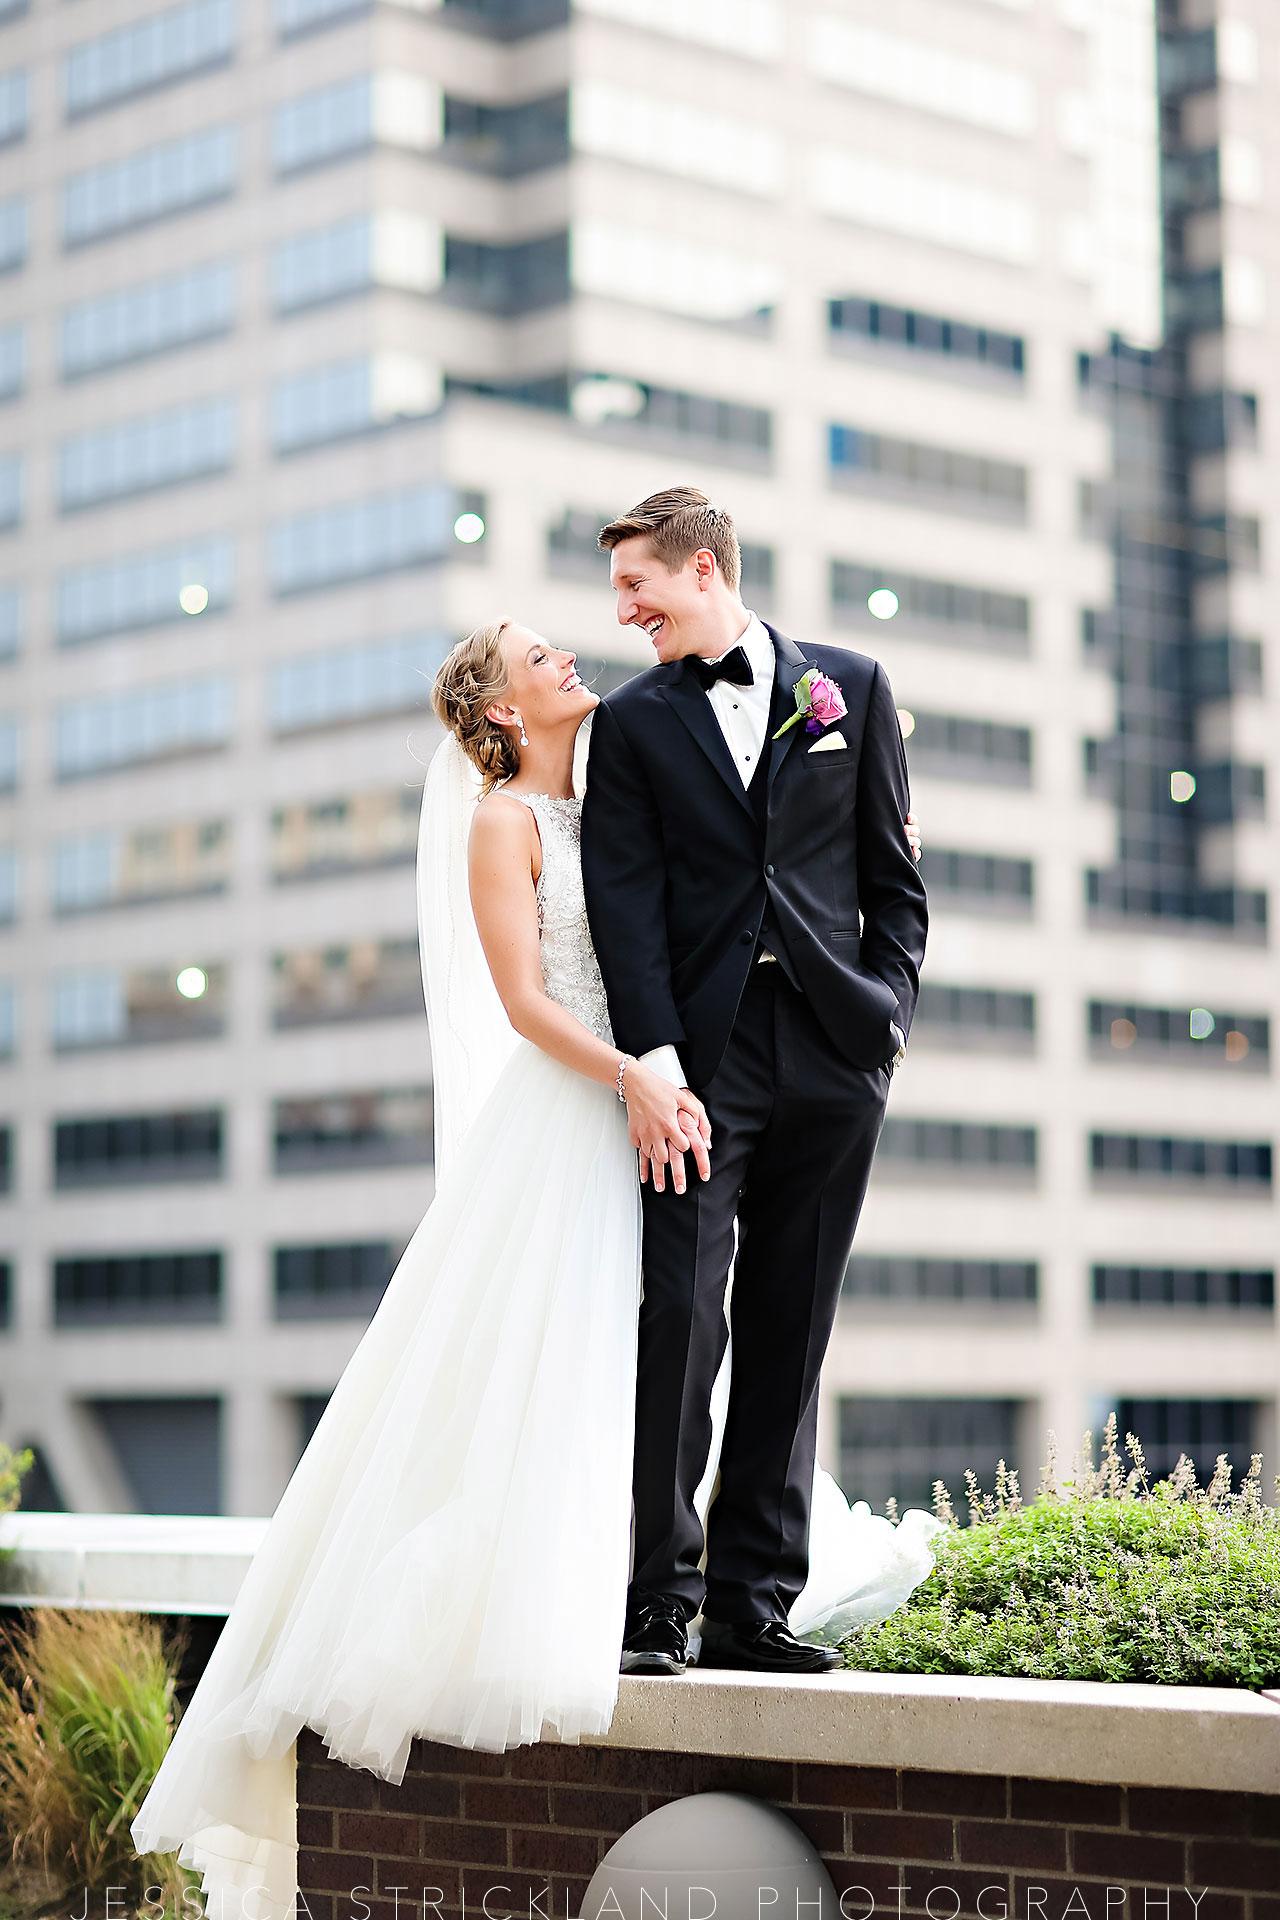 Serra Alex Regions Tower Indianapolis Wedding 251 watermarked